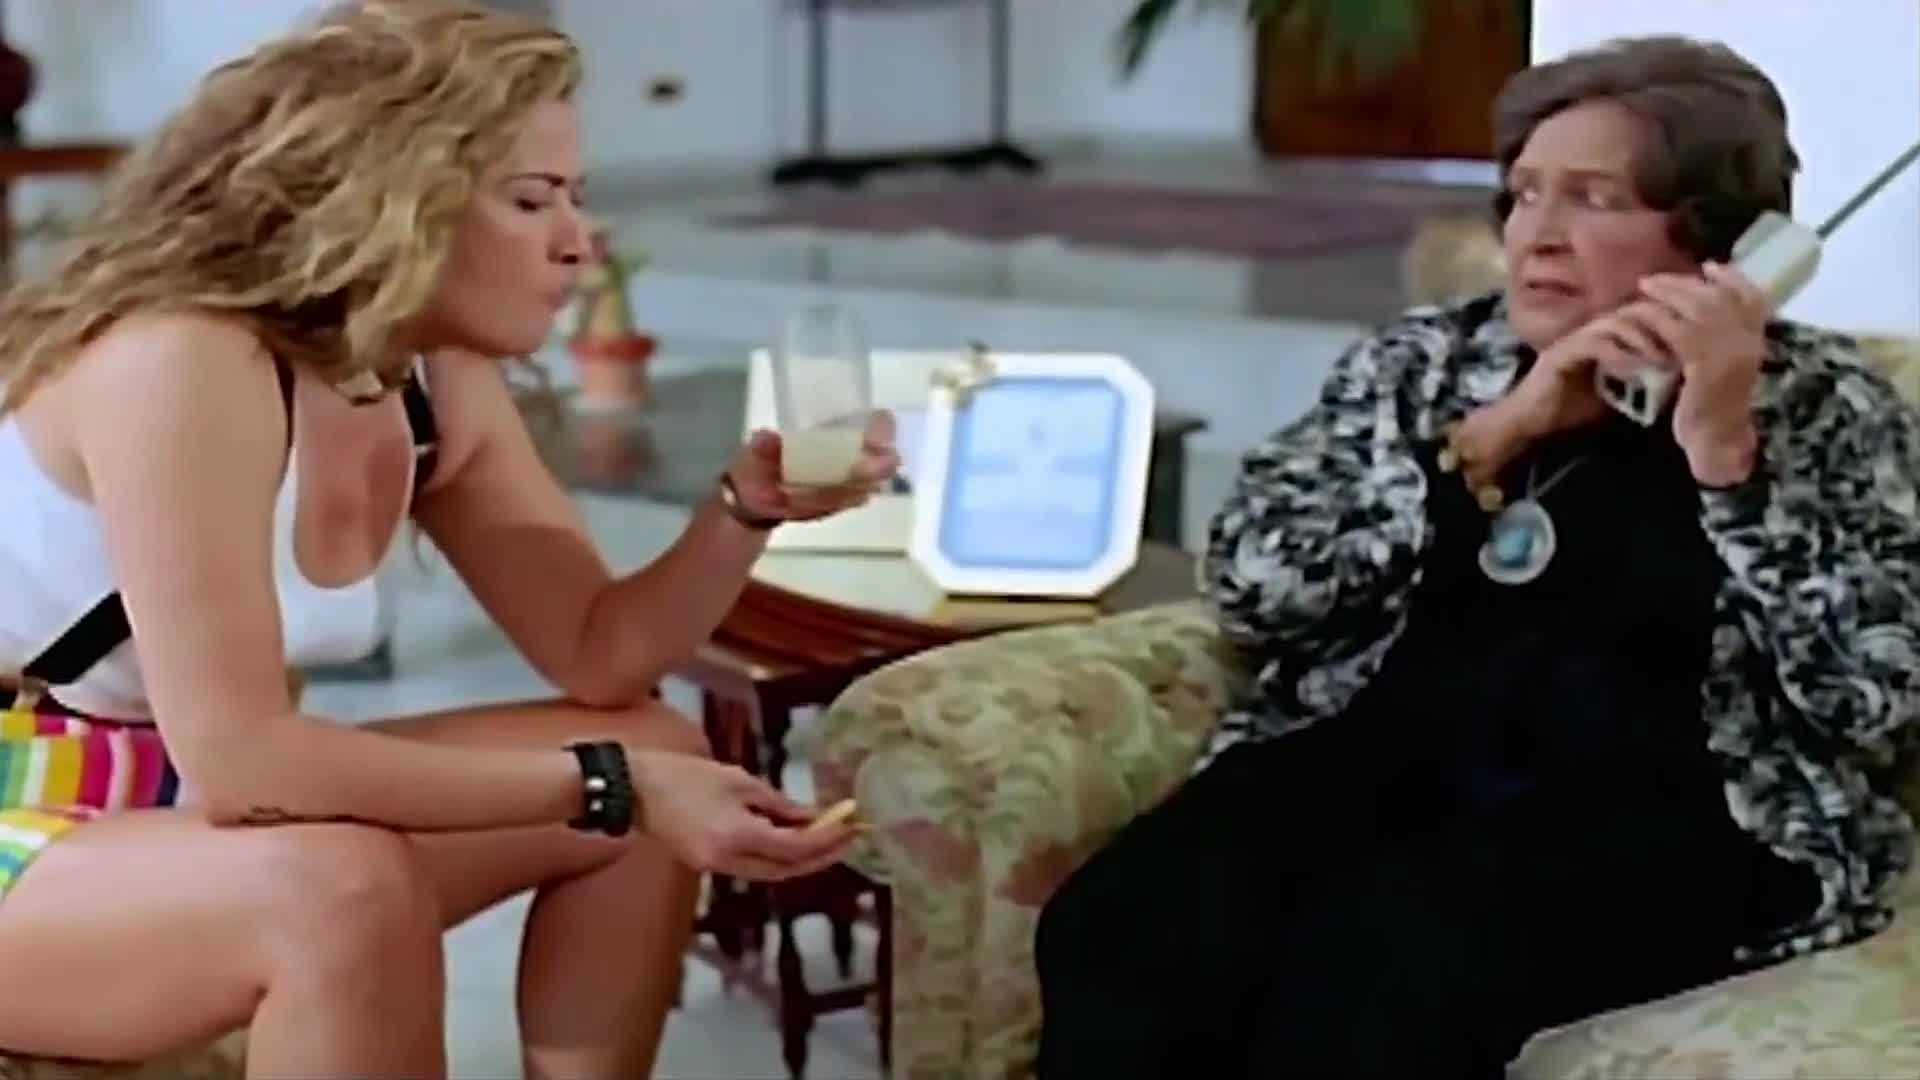 [فيلم][تورنت][تحميل][استاكوزا][1996][1080p][Web-DL] 7 arabp2p.com